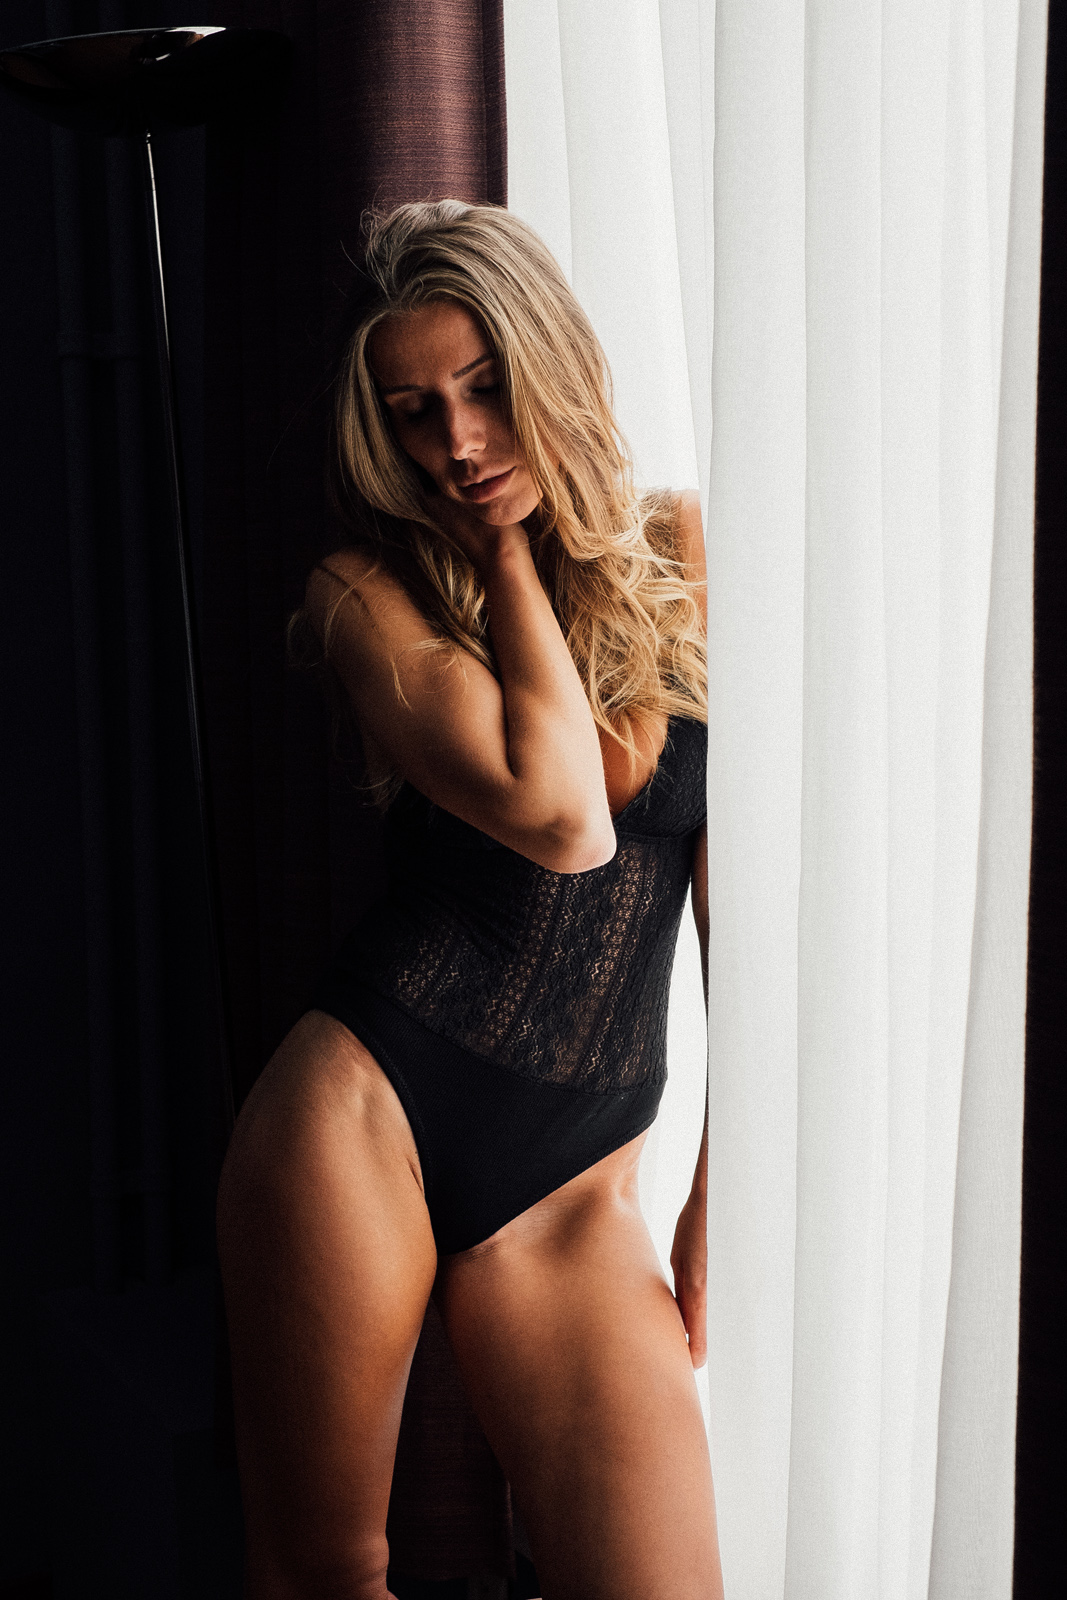 Stefani Women  Stefani Bosschaert Julien LRVR   // lionsmag.com - premium nude photography magazine